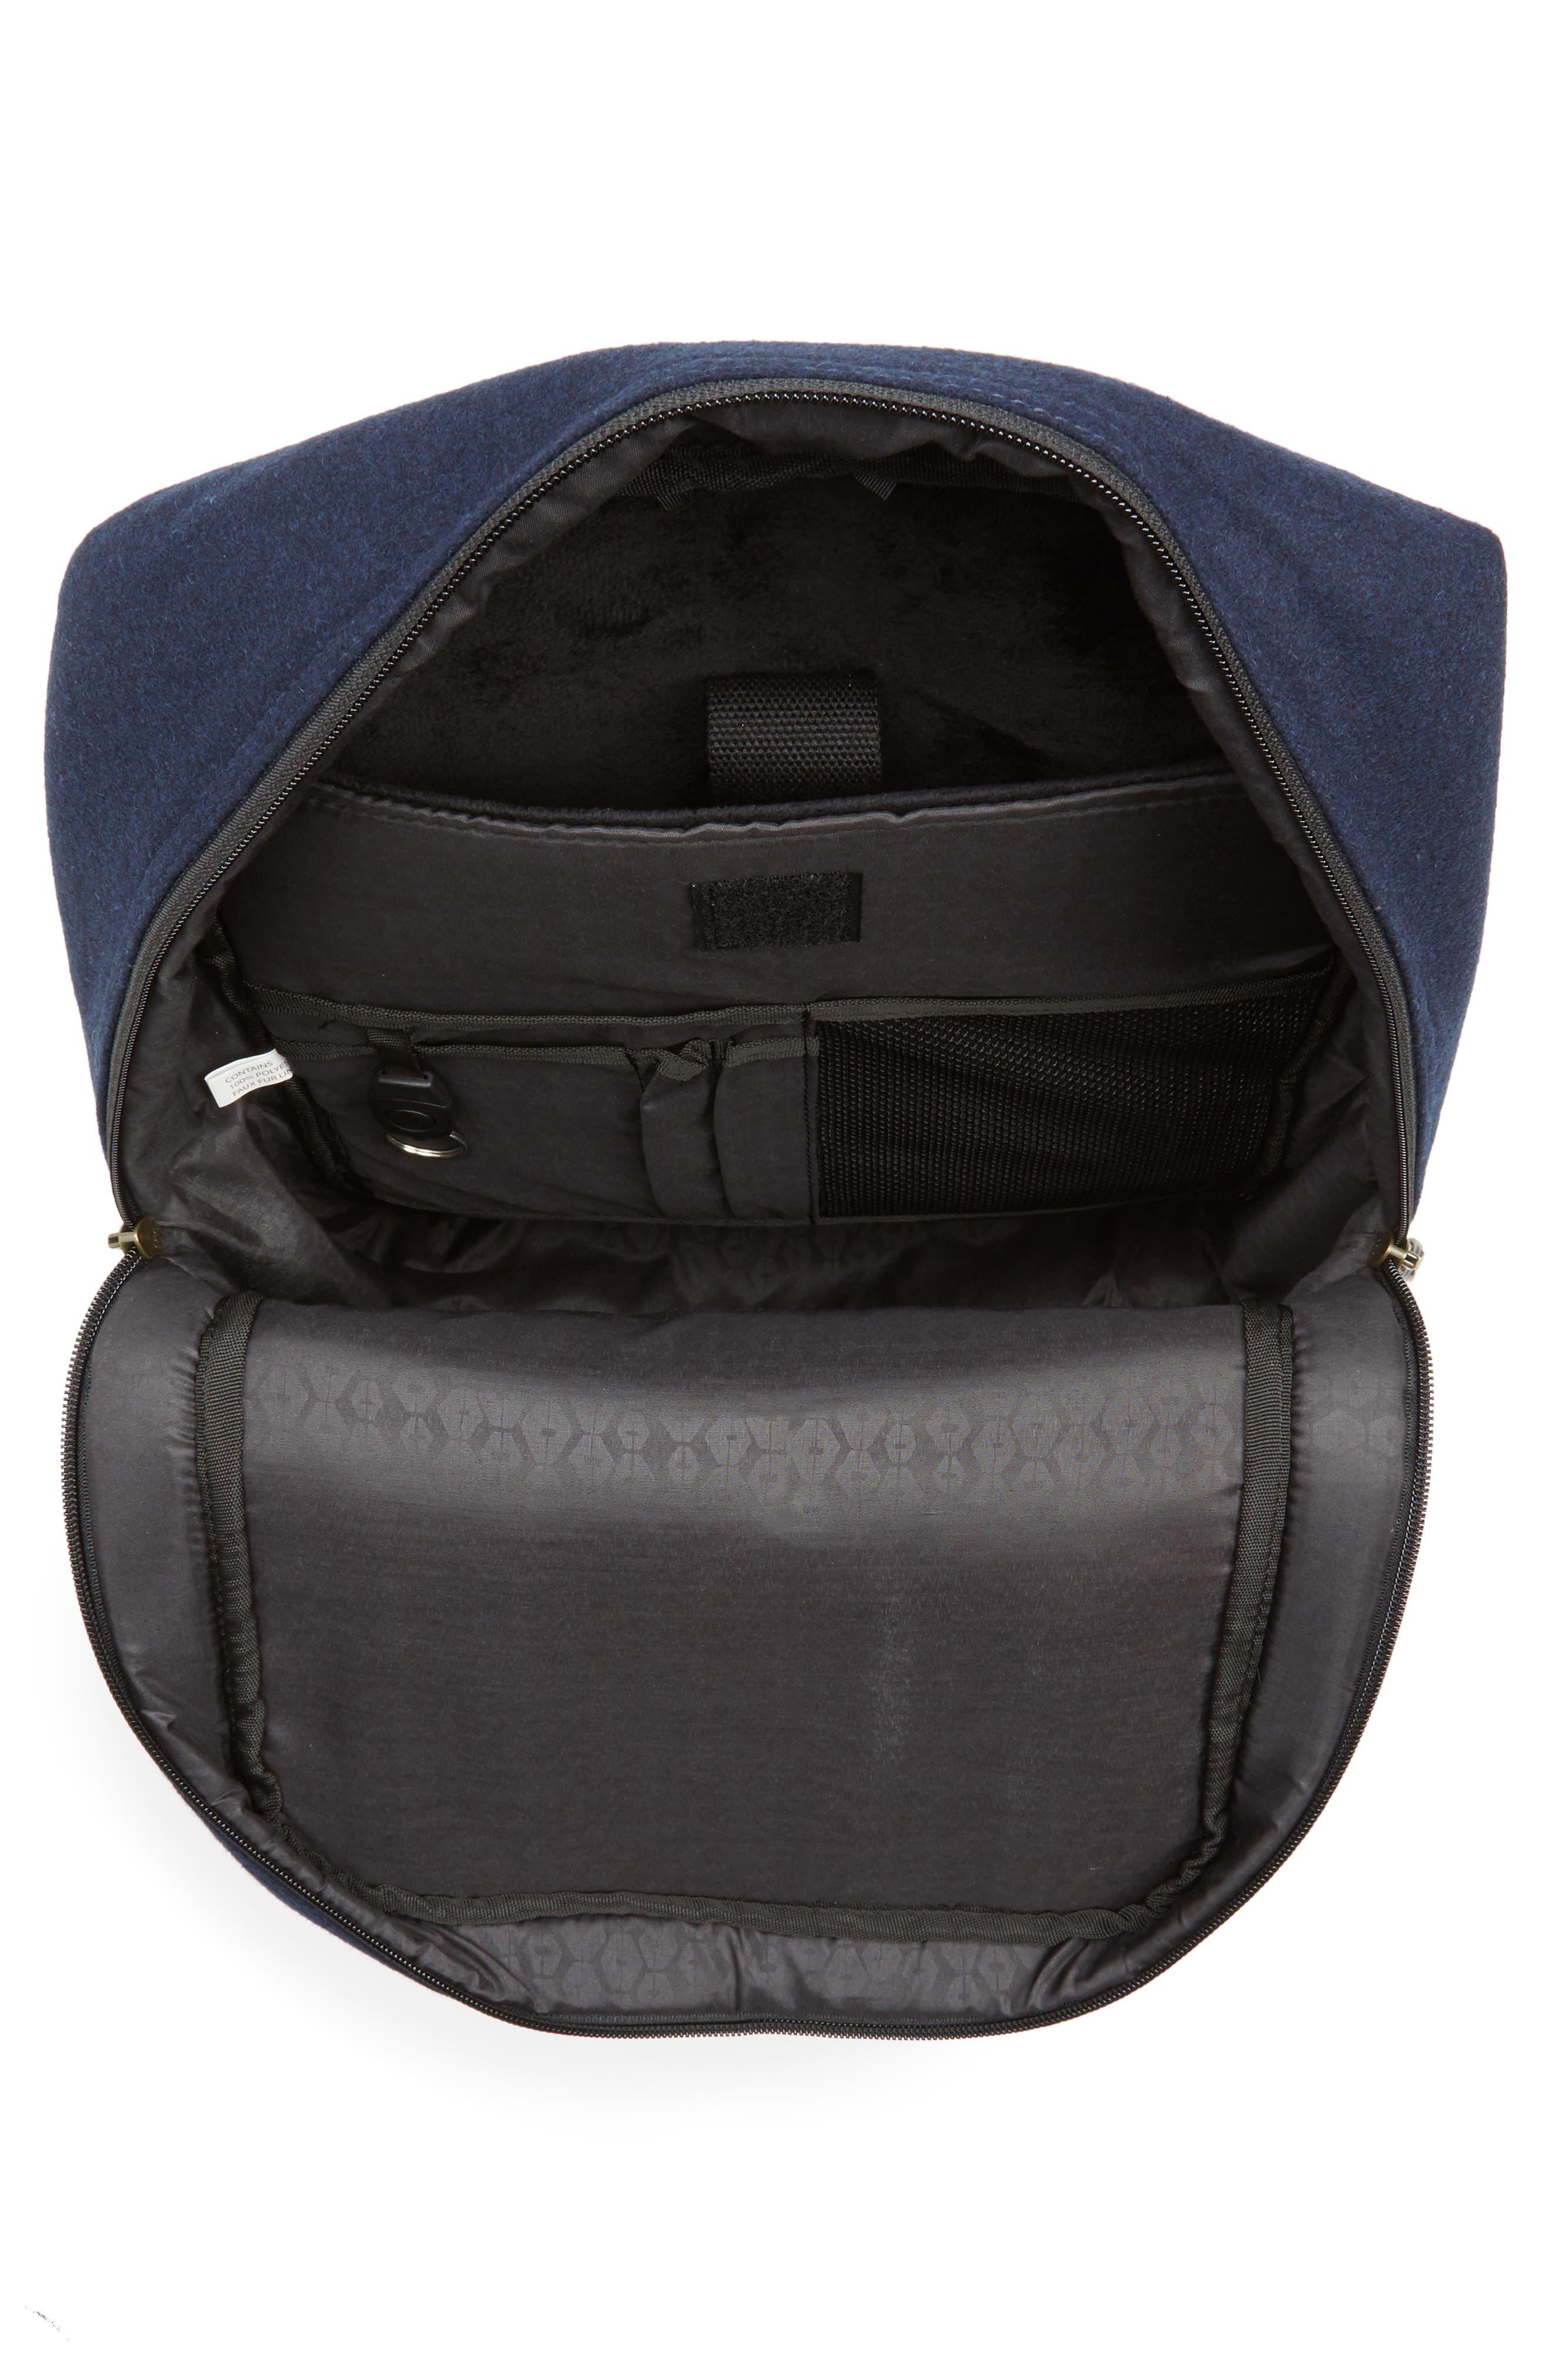 Radar Origin Water Resistant Commuter/Travel Laptop Backpack,                             Alternate thumbnail 4, color,                             410